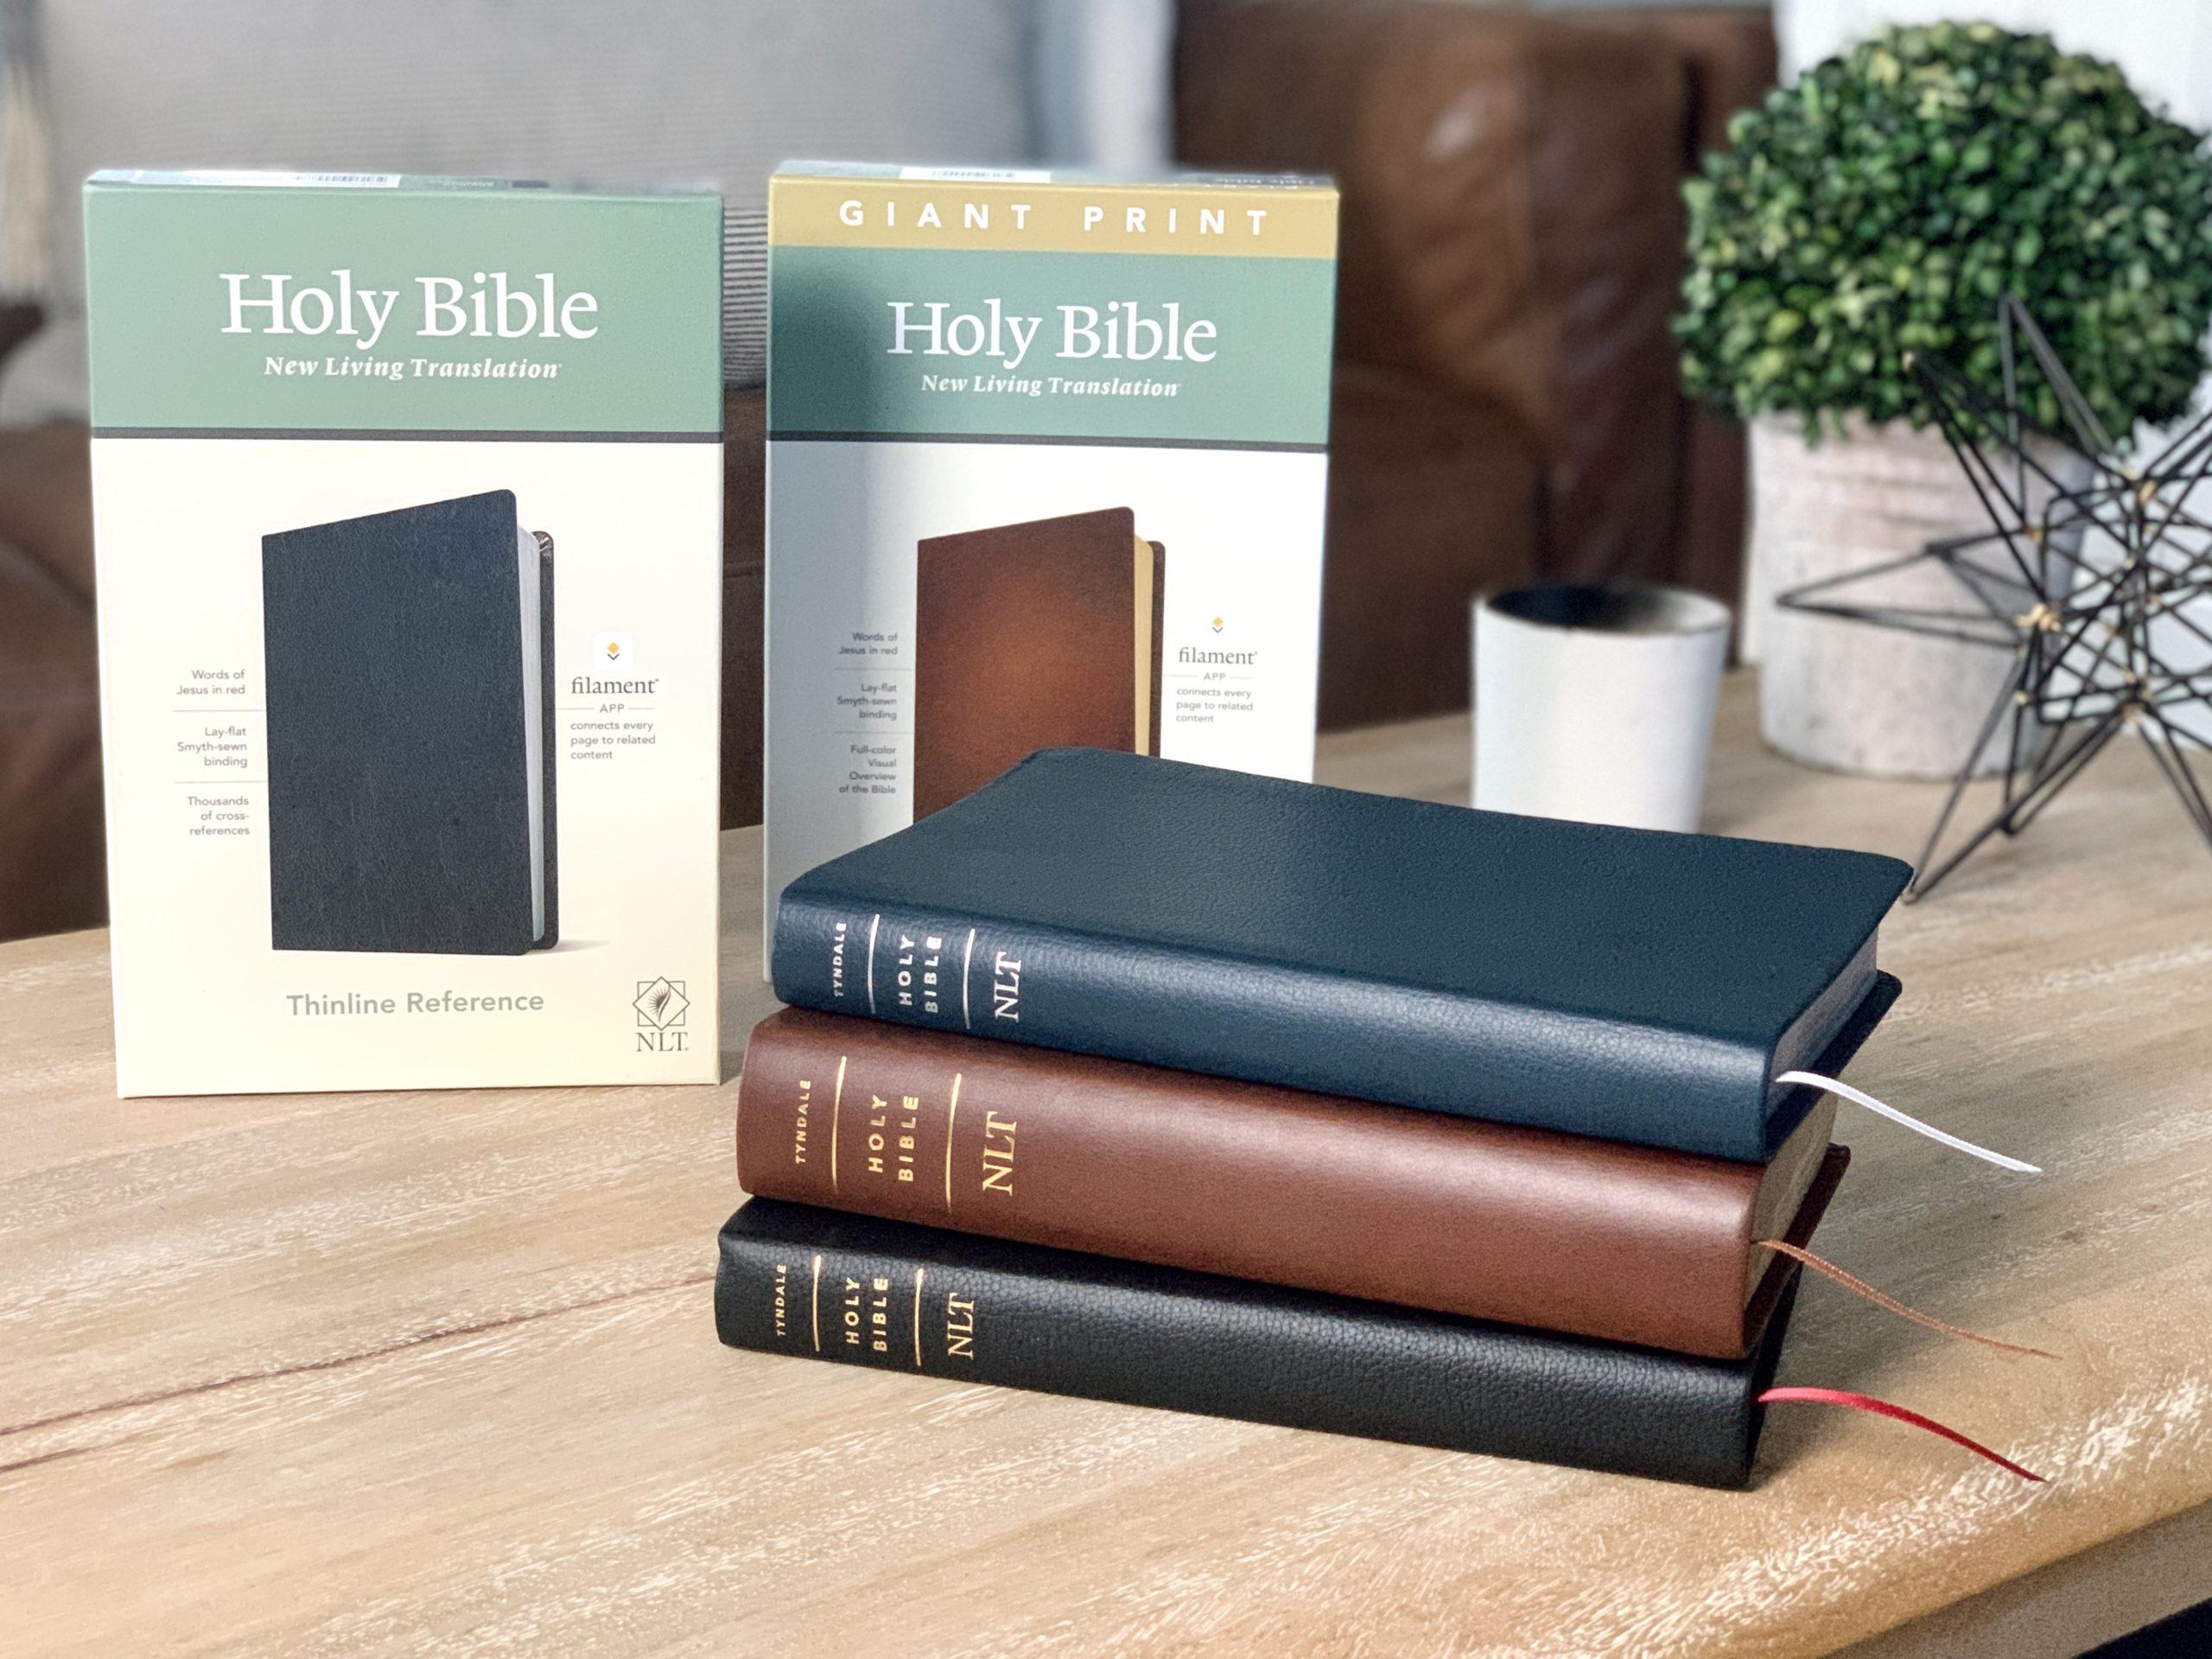 Filament Bible